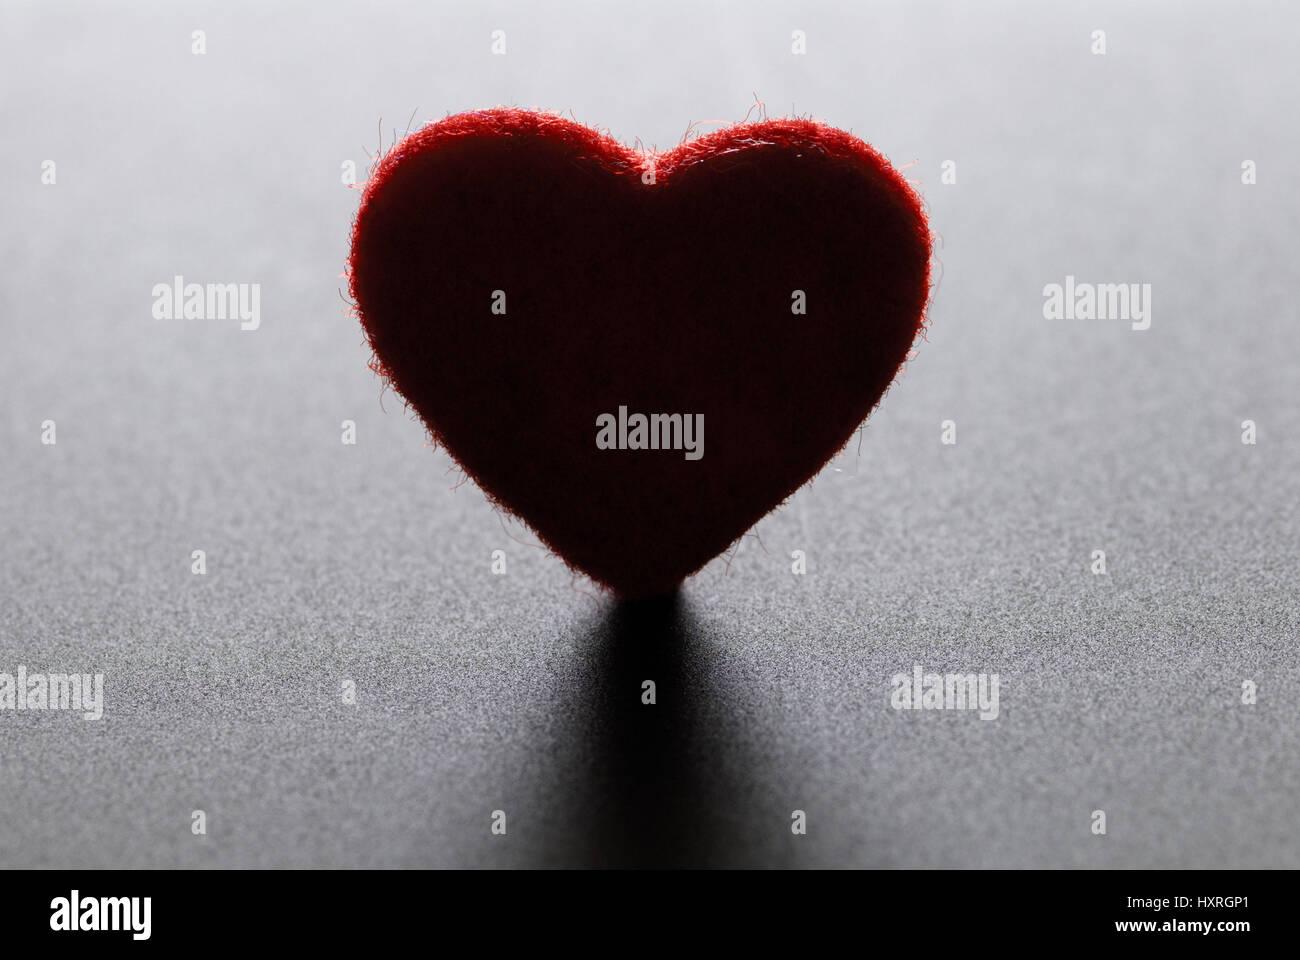 Dark heart, lovesickness, melancholy, love, dear pain, heart-shaped, darkly, shades, red, red, miniature, separation, - Stock Image